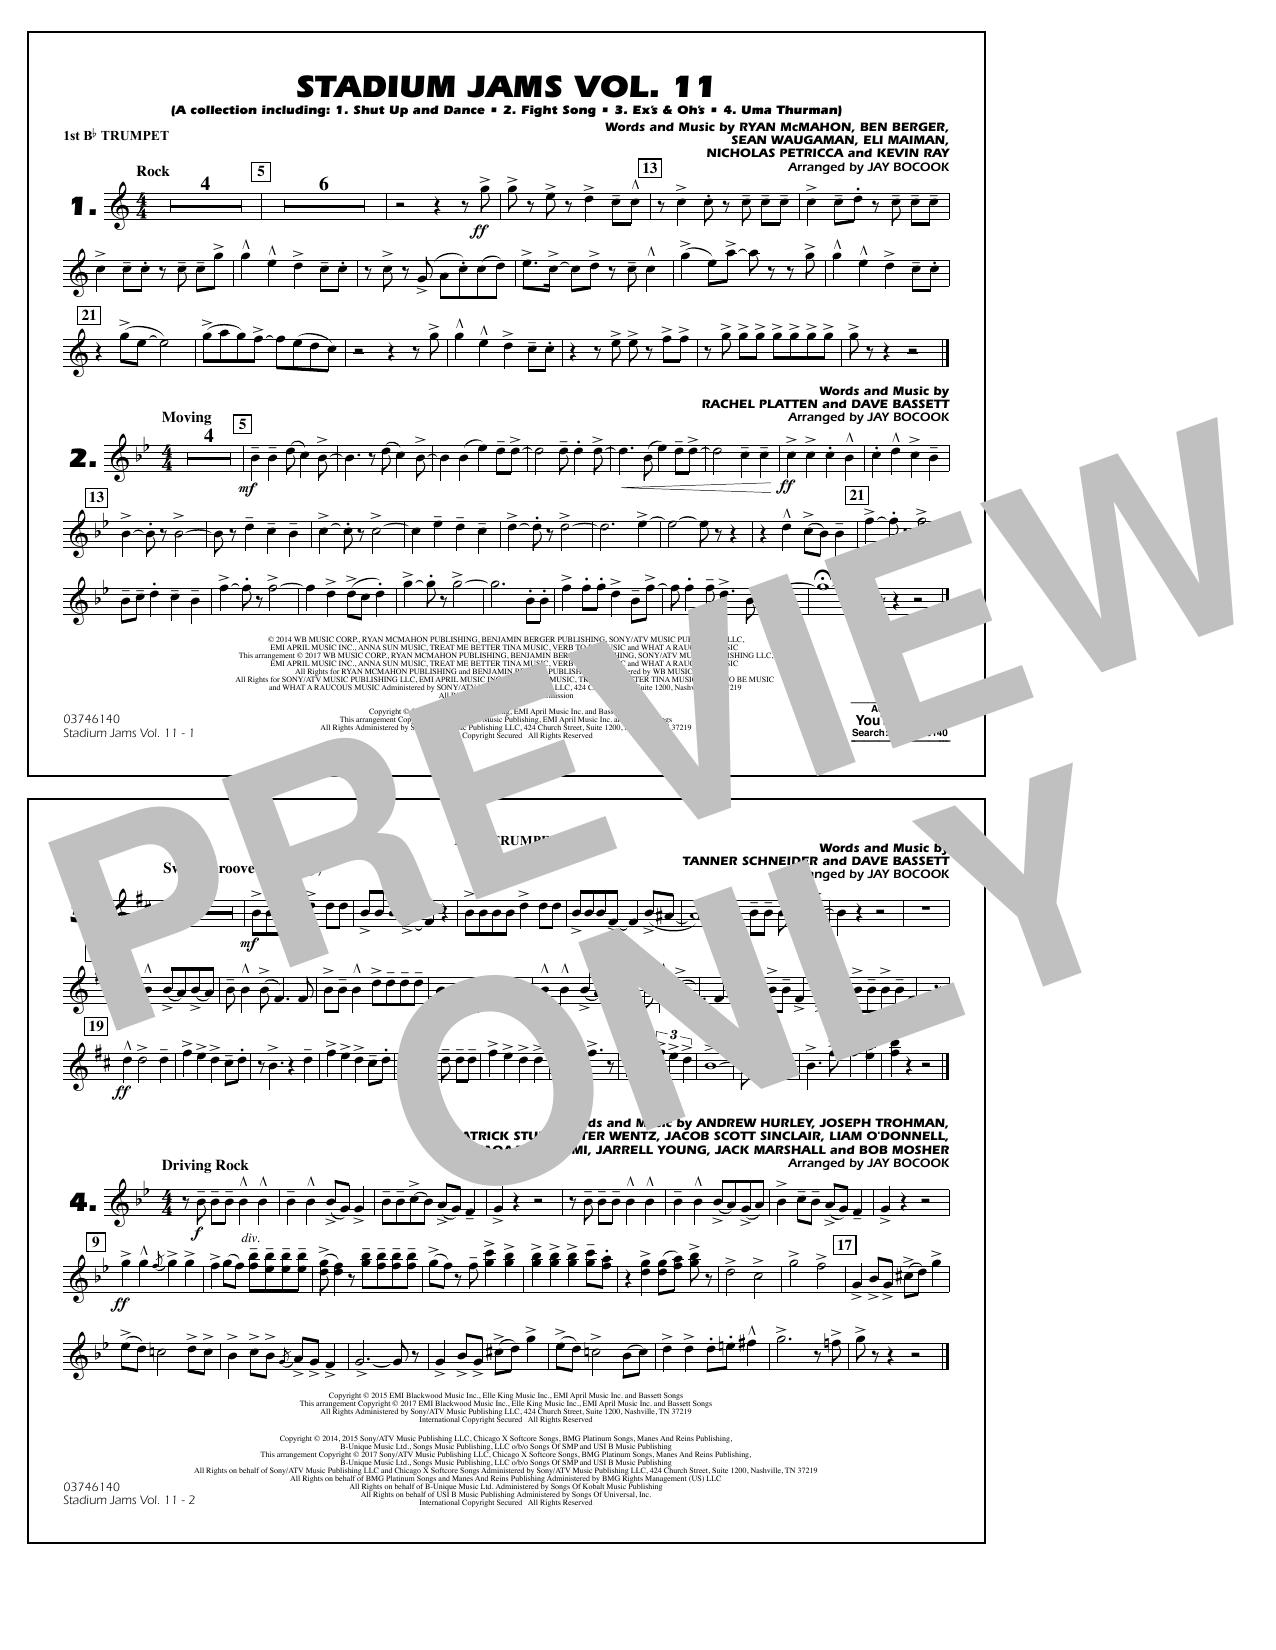 Stadium Jams Volume 11 - 1st Bb Trumpet Sheet Music